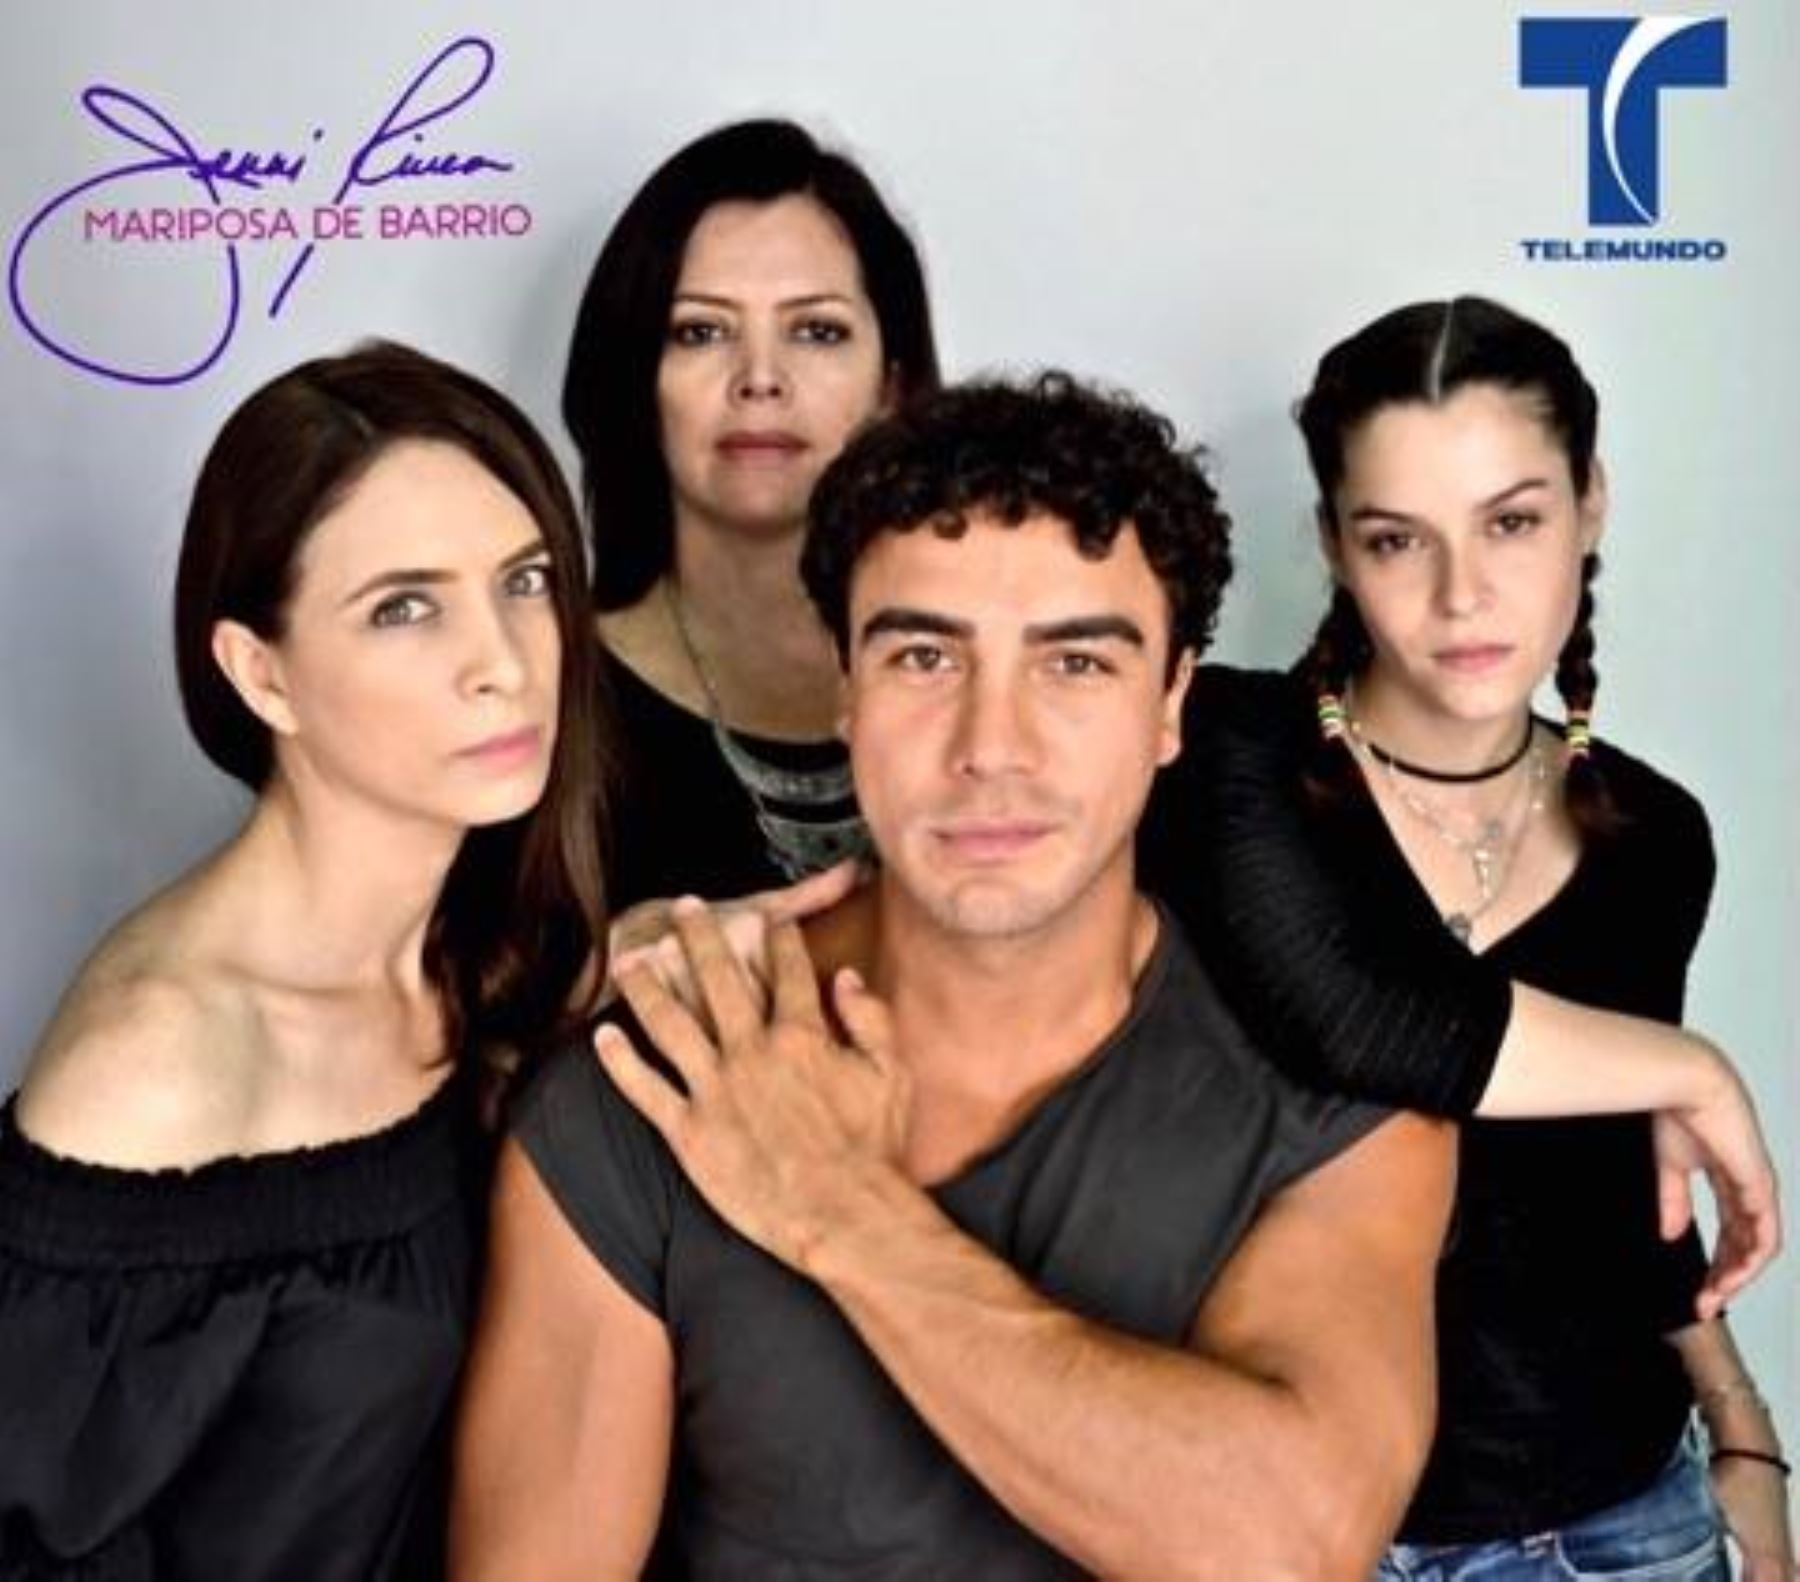 Canal telemundo internacional online dating 3